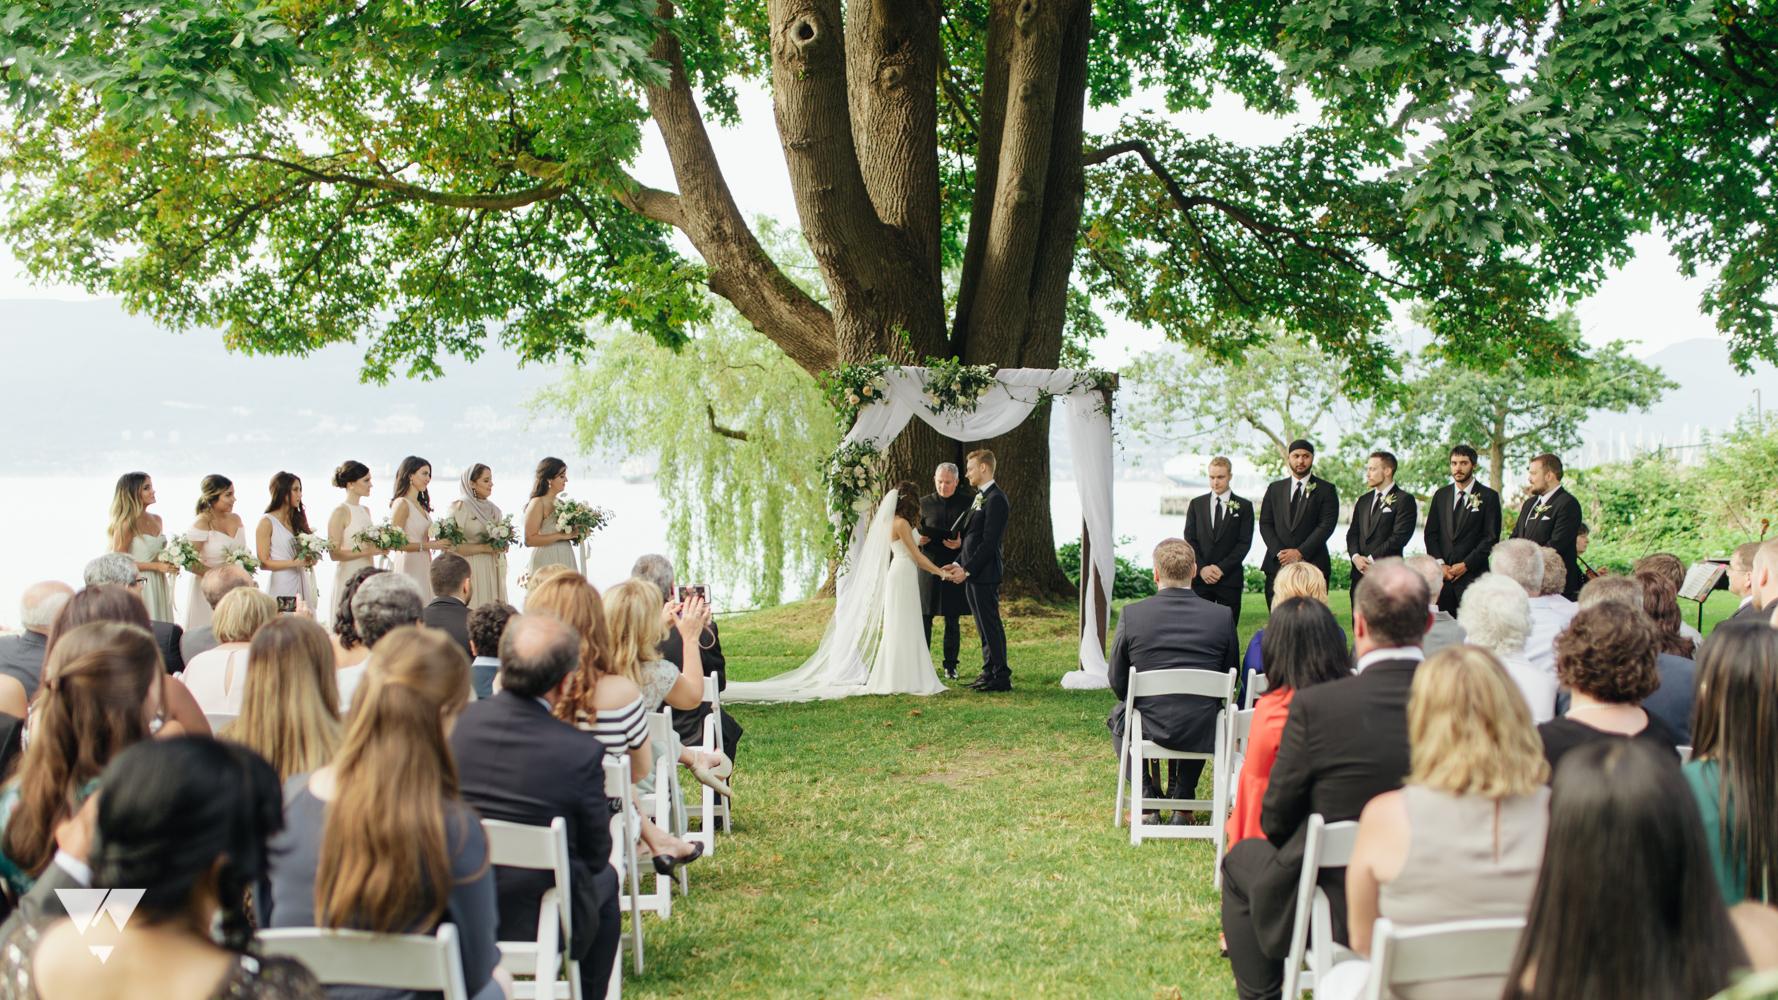 herastudios_wedding_sadaf_logan_hera_selects_web-43.jpg